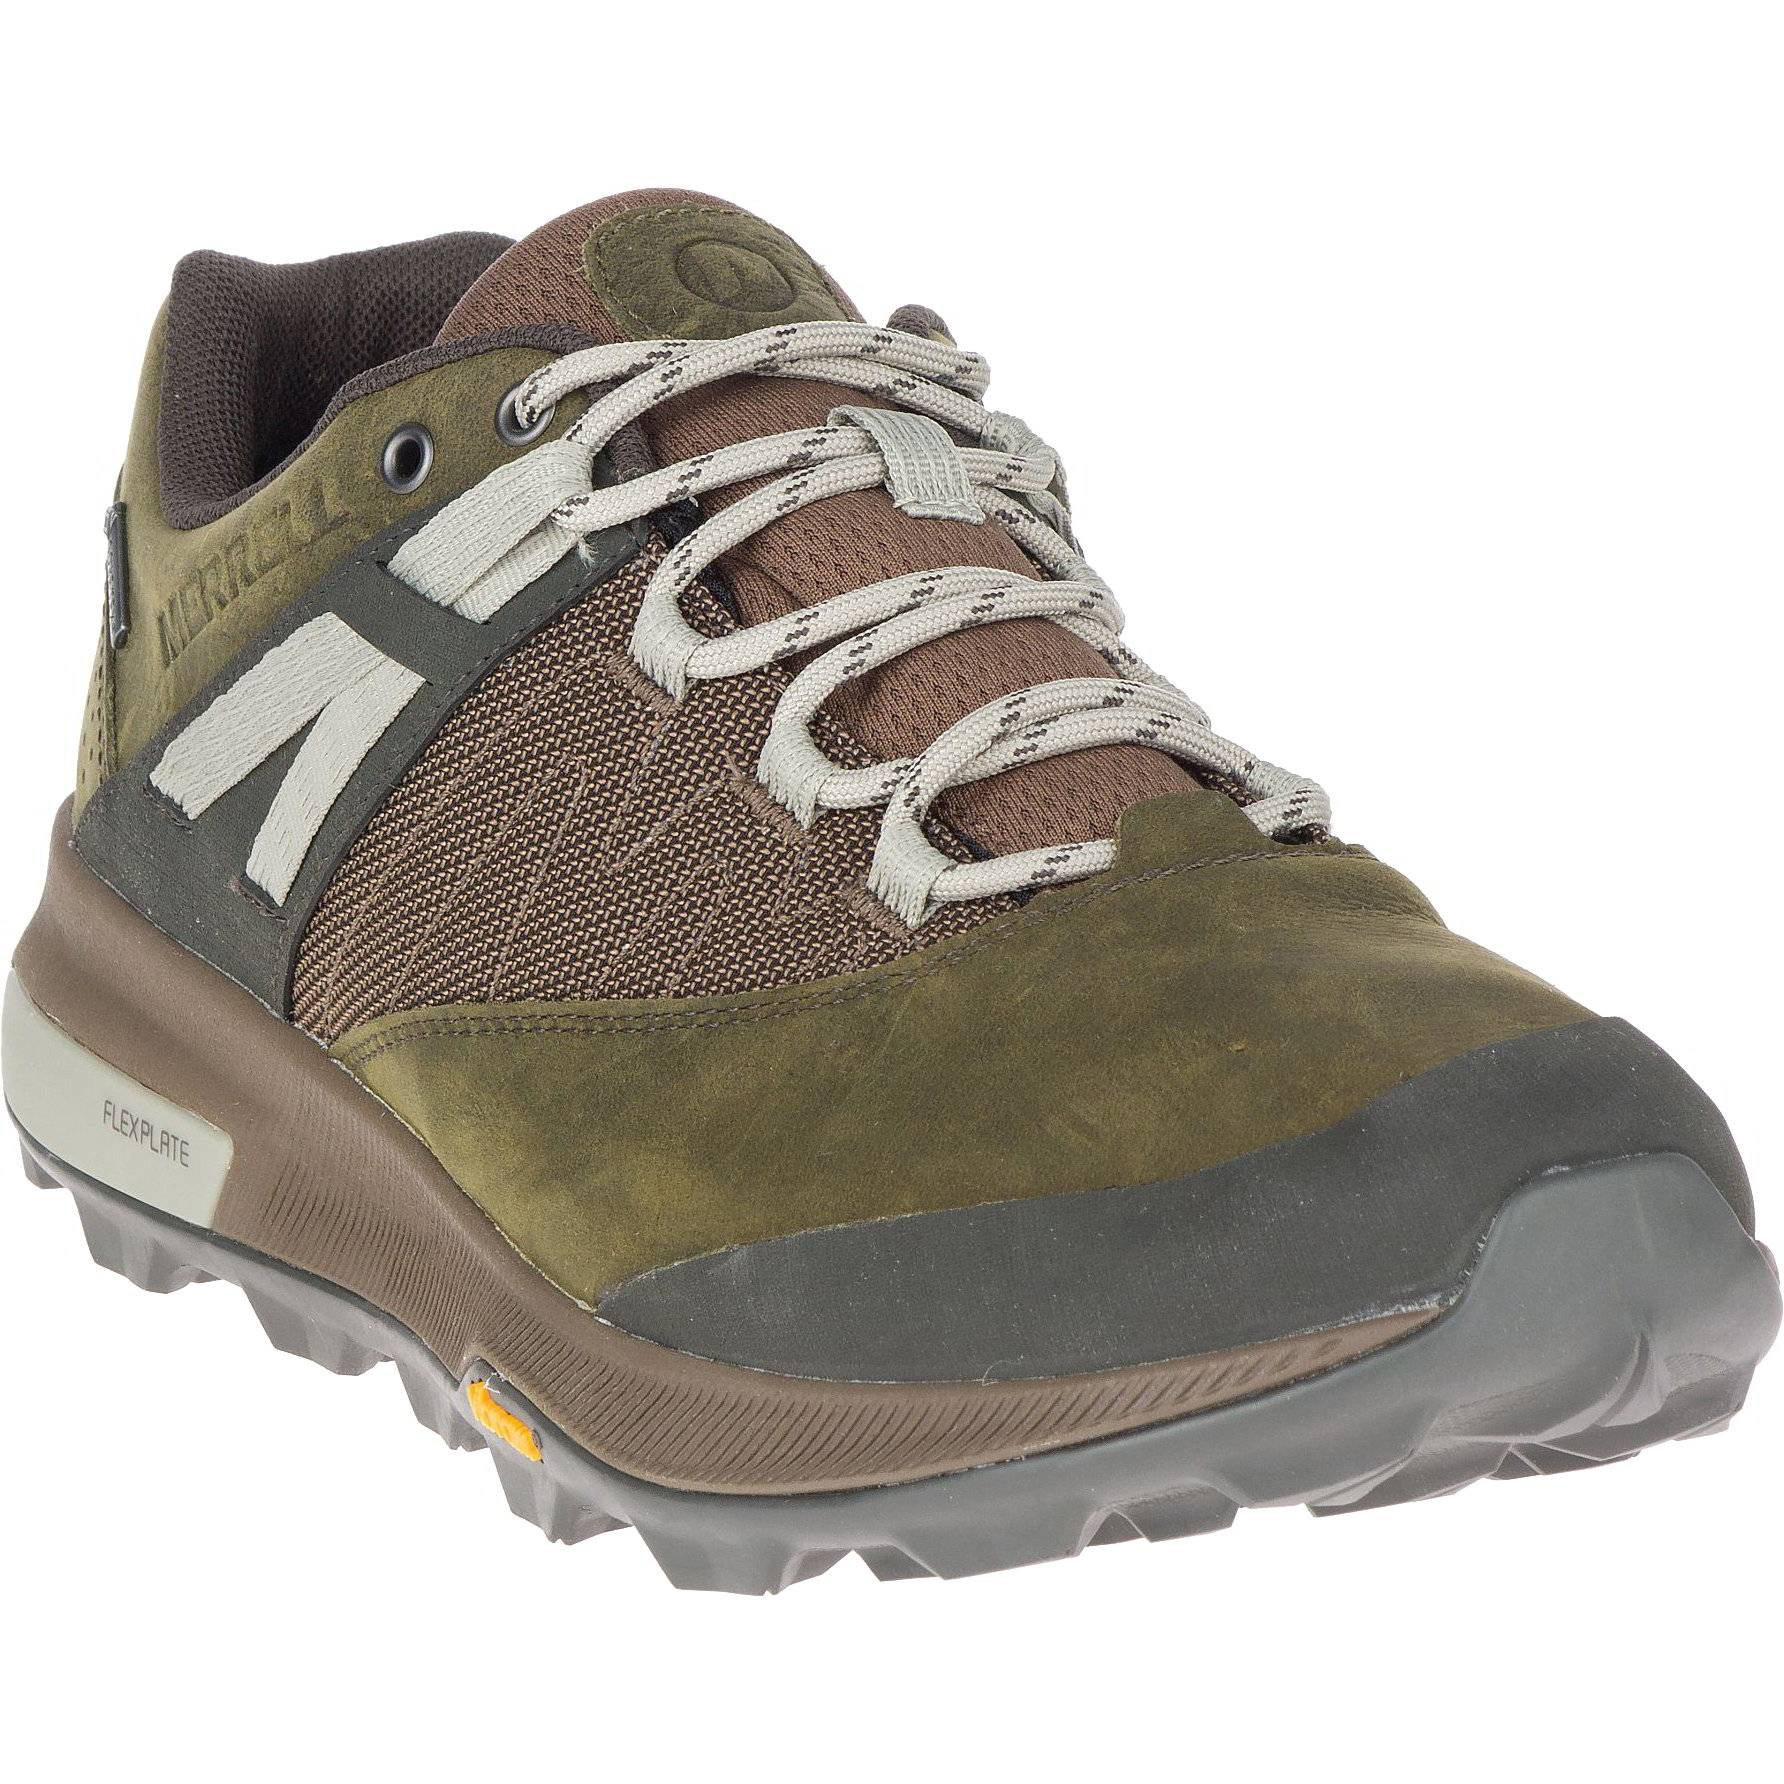 Merrell Mens Zion GTX Waterproof Walking Hiking Shoes Trainers - UK 10.5 - Green